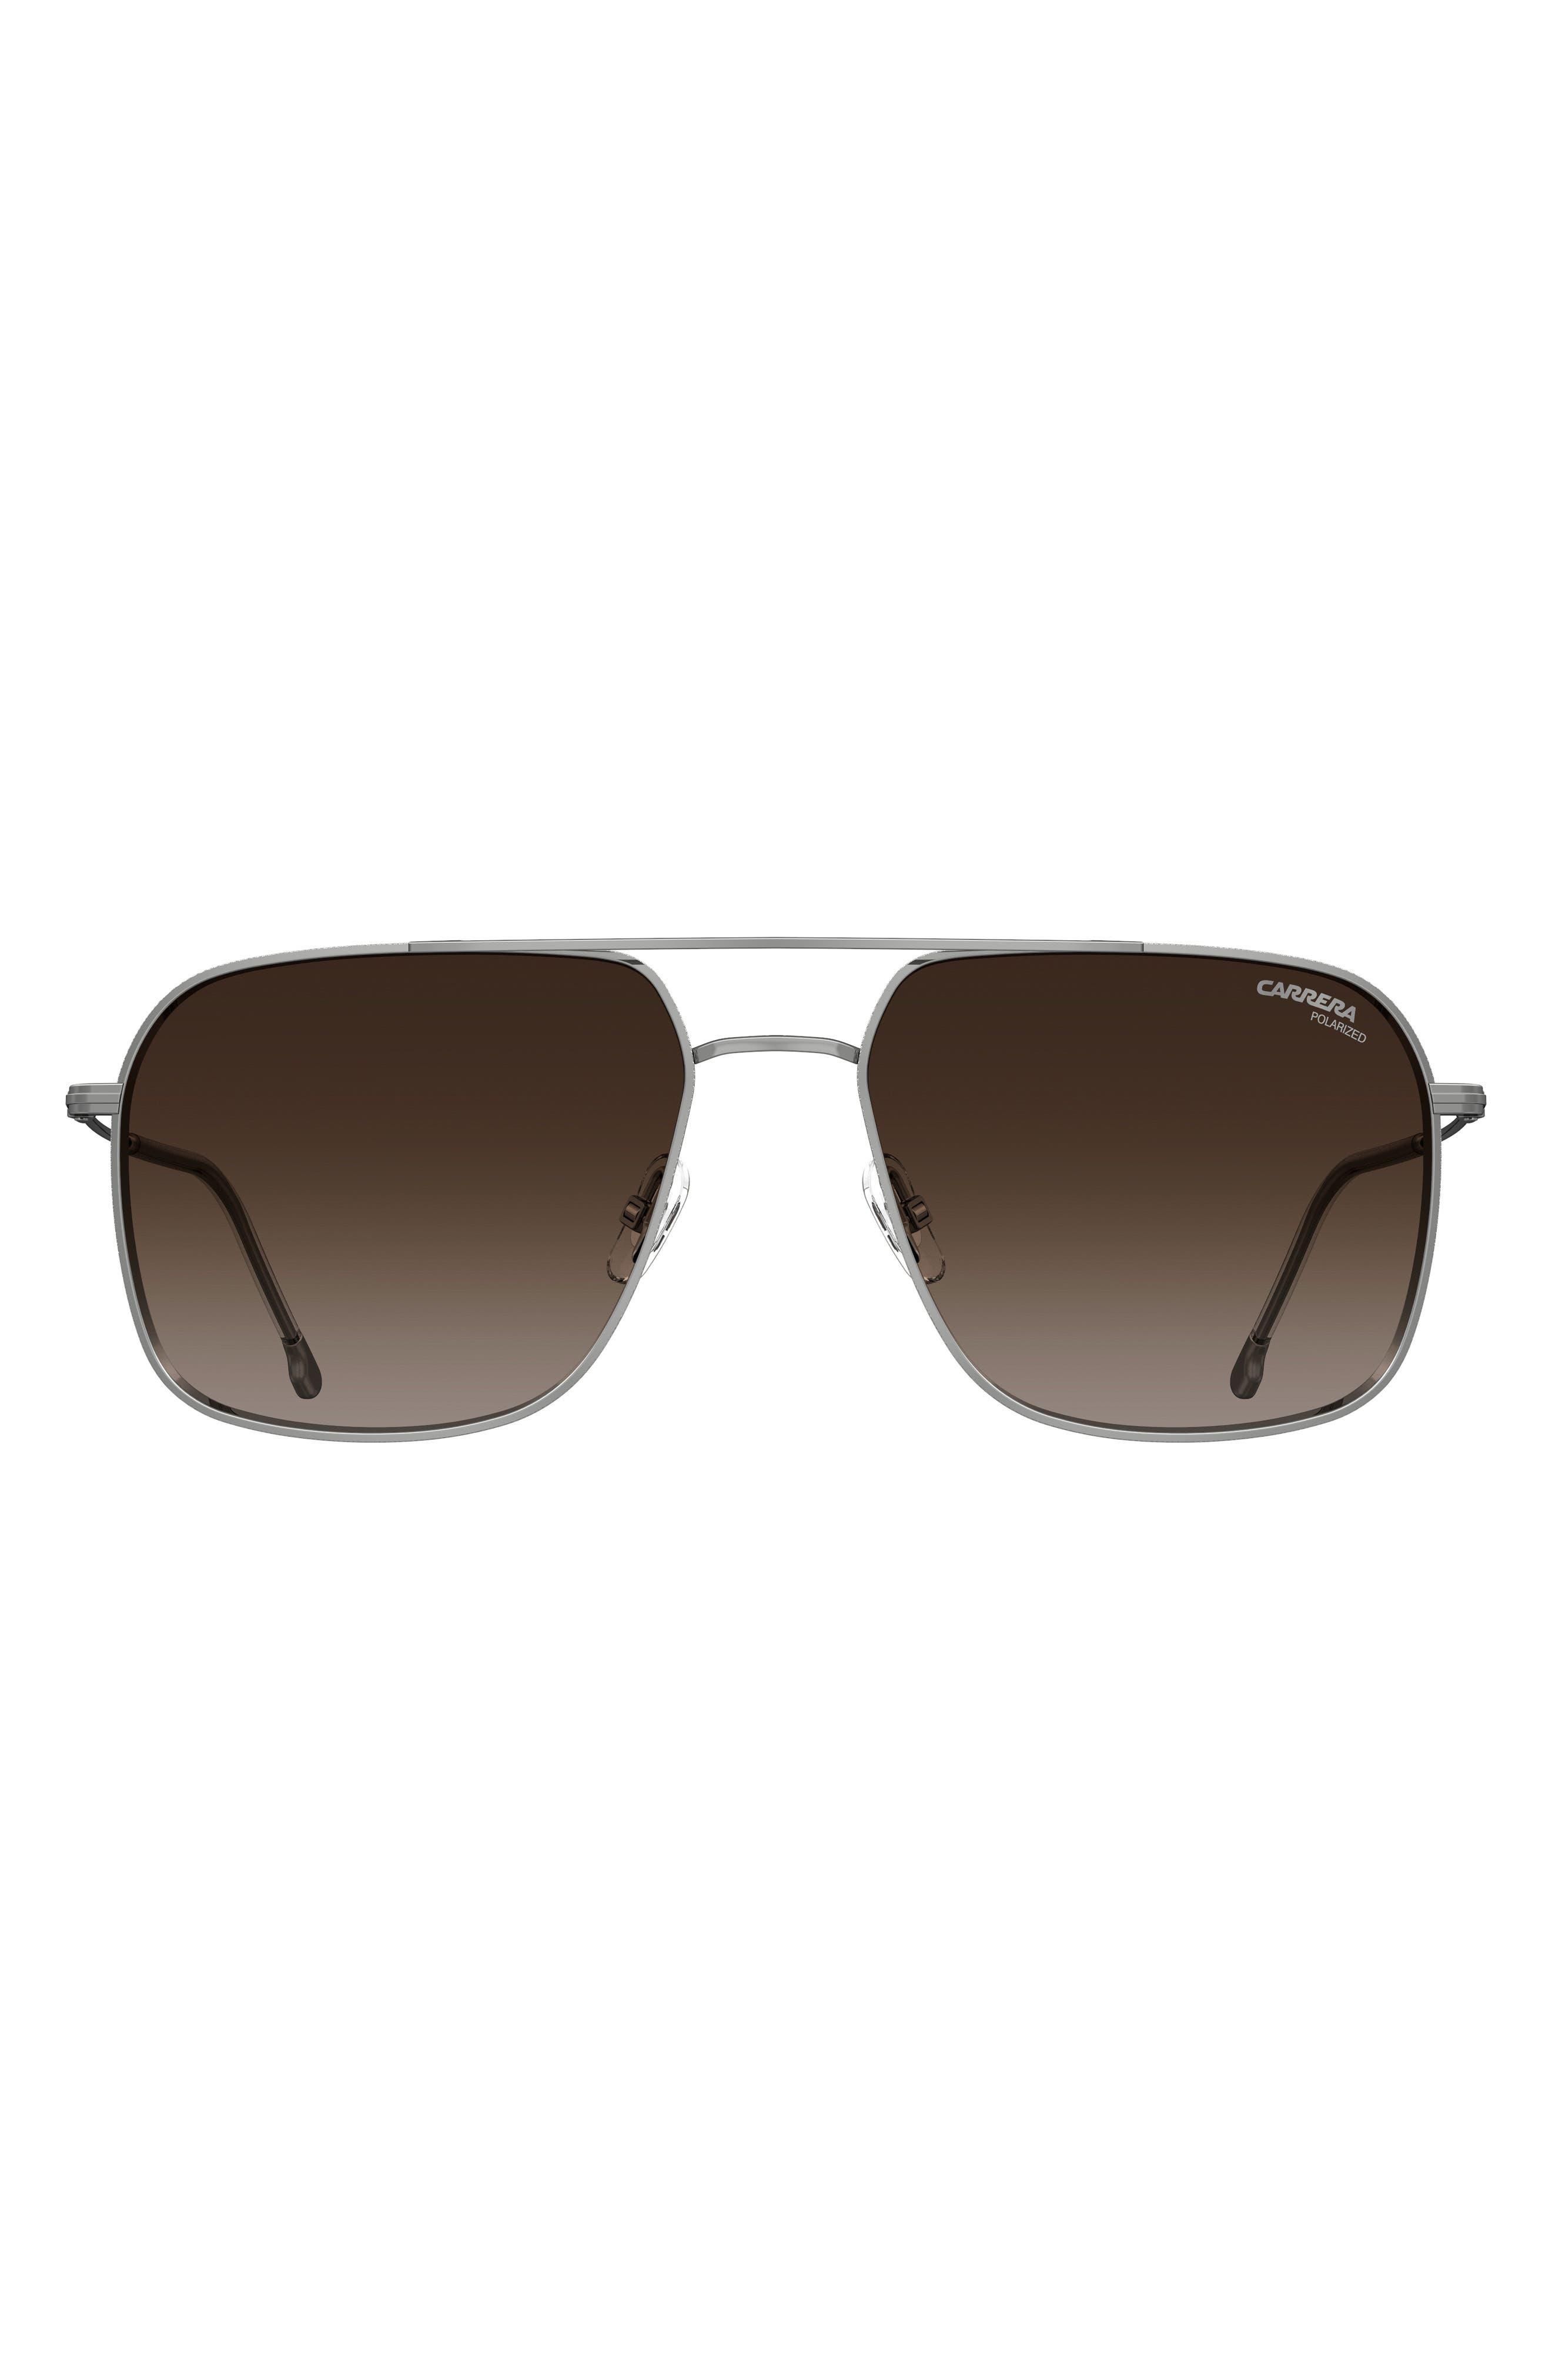 Ca 247 58mm Navigator Sunglasses